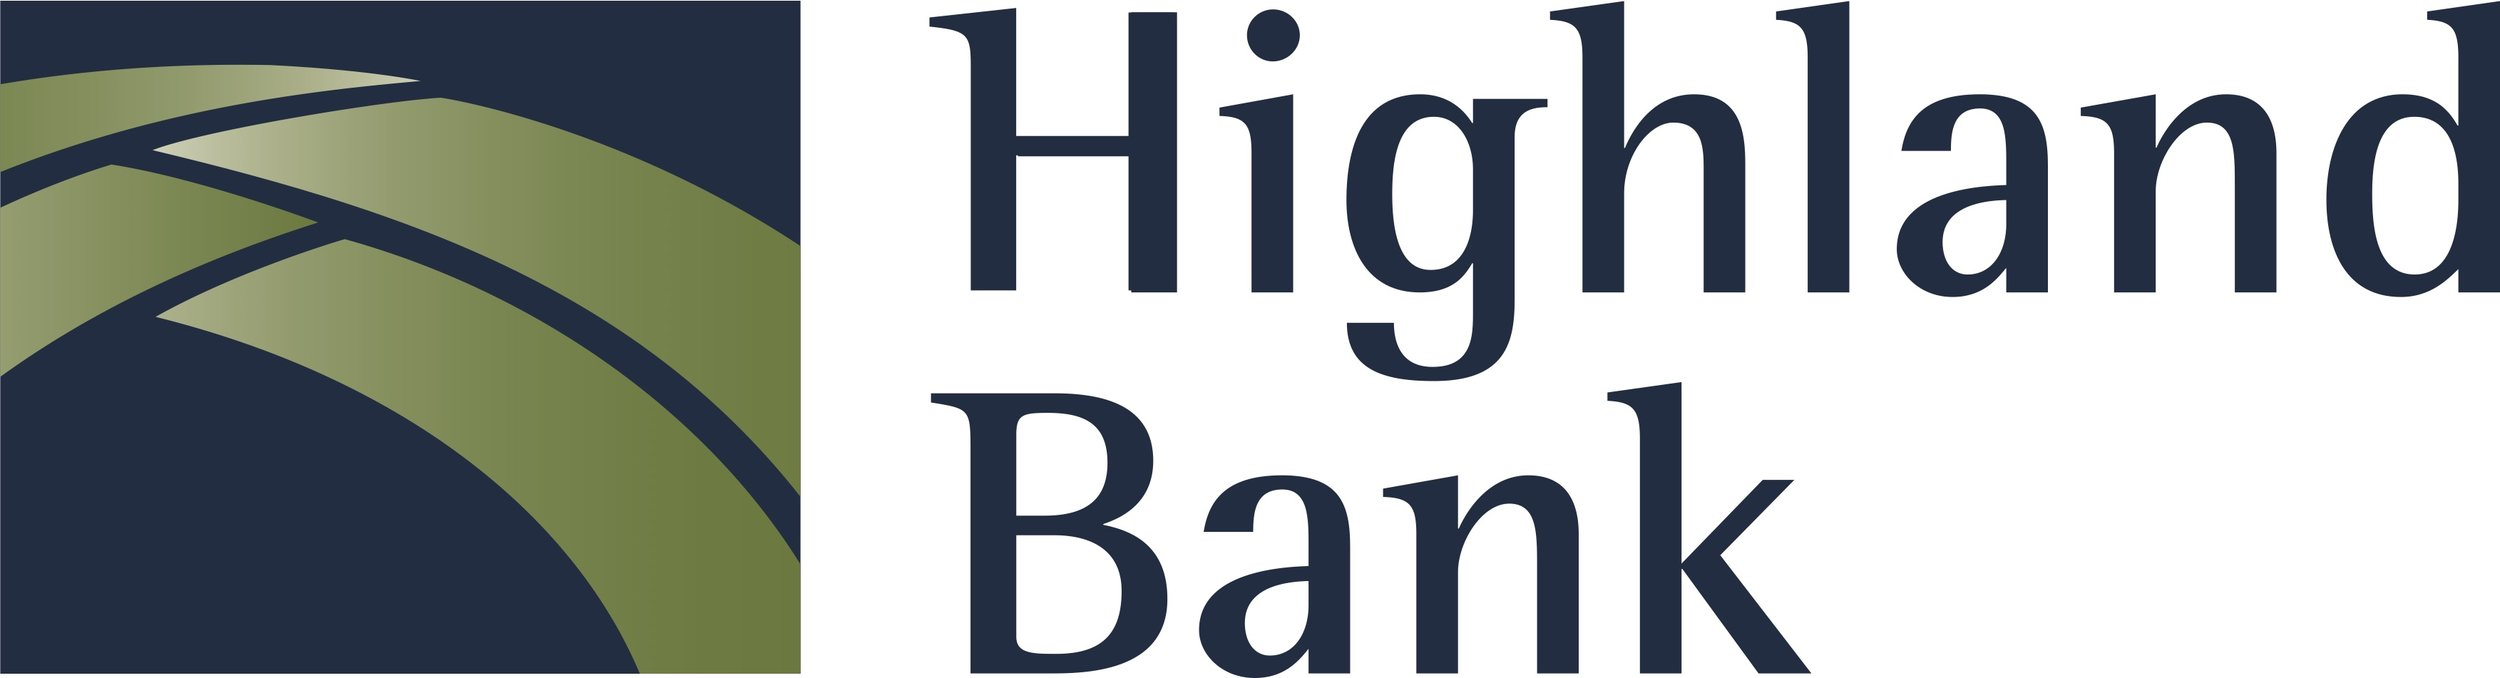 HB-logo_simple_stacked.jpg